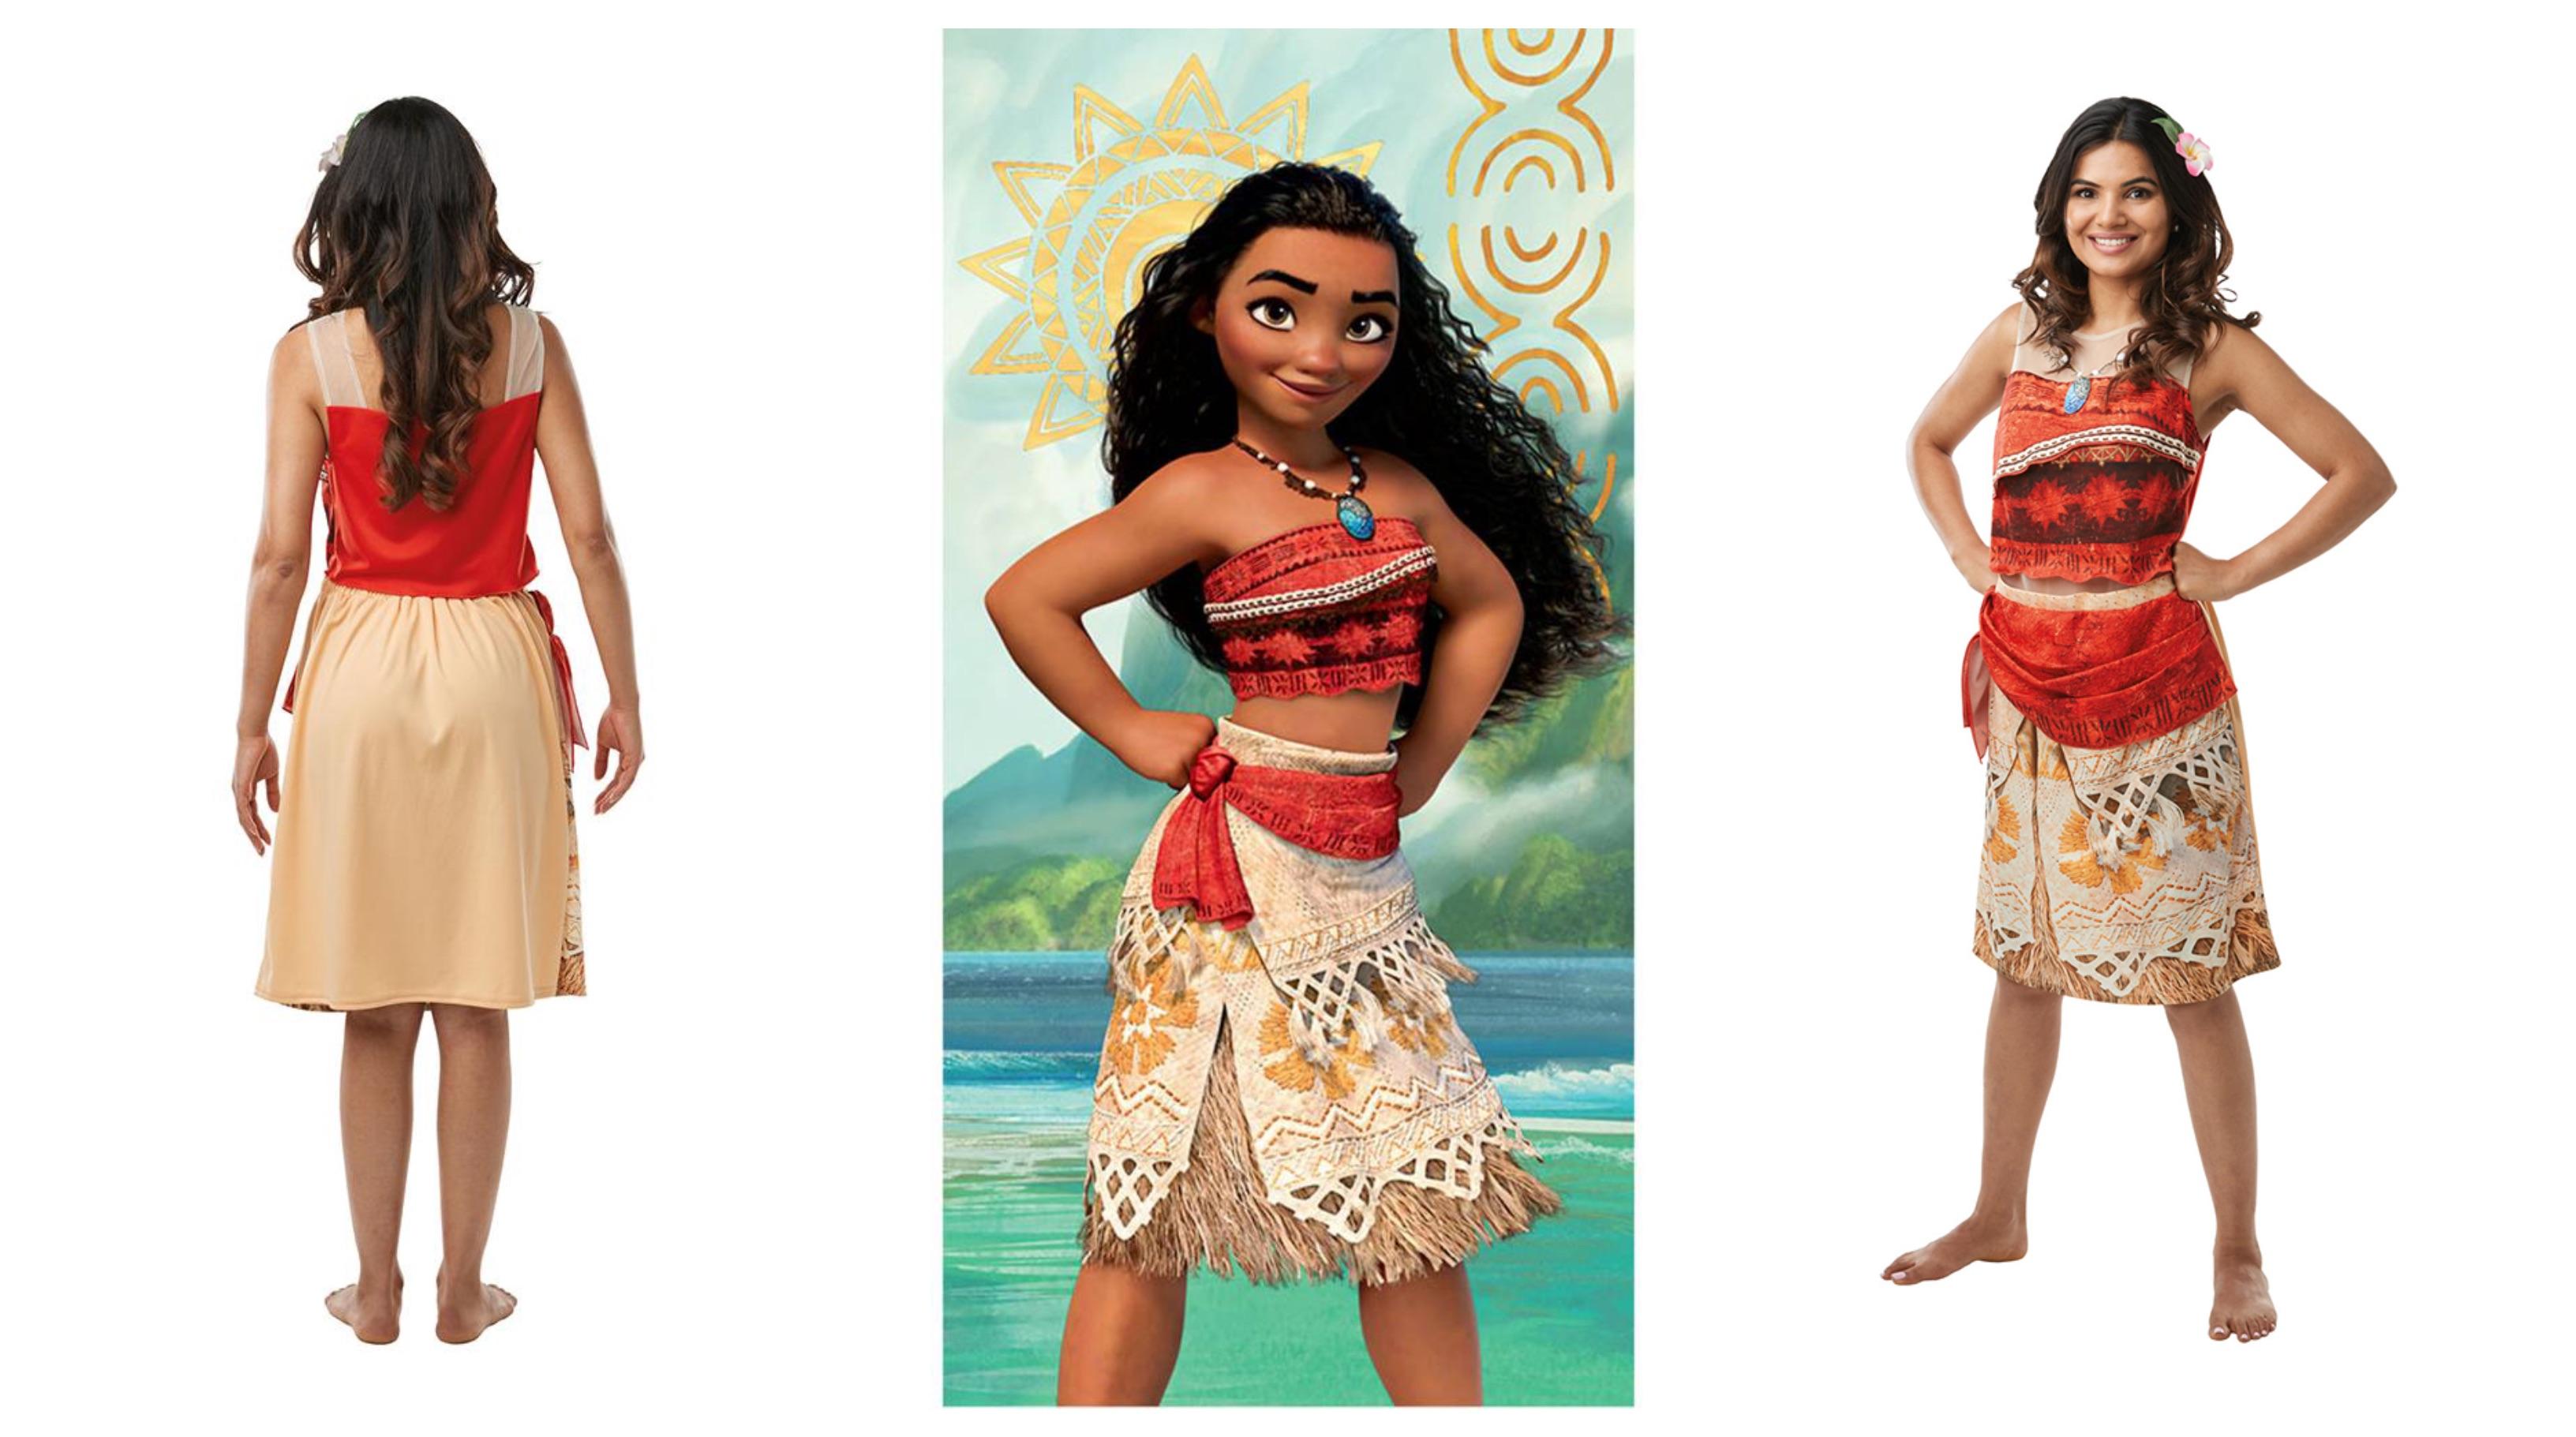 vaiana kostume til voksne, vaiana kostume, vaiana udklædning til voksne, moana kostume til voksne, moana voksenkostume, vaiana voksenkostume, vaiana fastelavnskostume til voksne, disney kostume til voksne, disney voksenkostumer